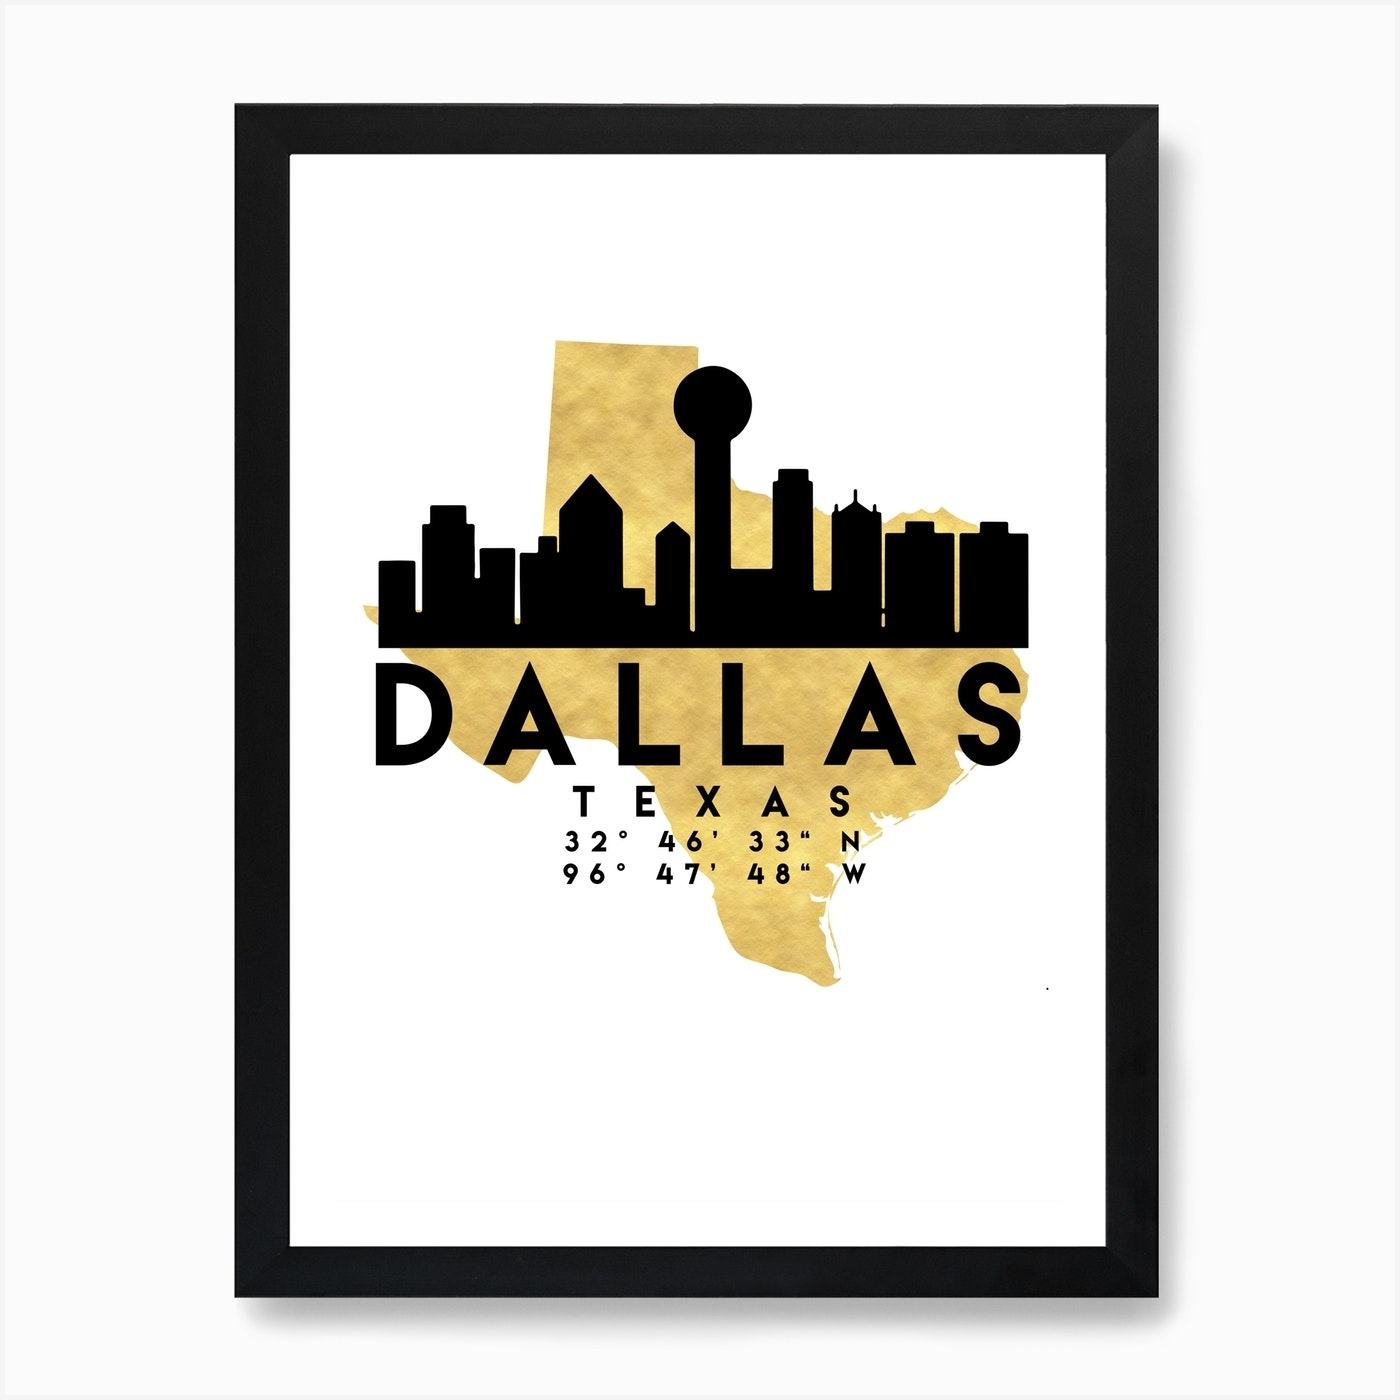 Dallas Texas Silhouette City Skyline Map Art Print on washington dc city map, dfw area map, yoakum city map, princeton city map, dallas old maps, fort worth texas city limits map, university of chicago city map, palestine city map, grimes city map, houston city map, denton city map, greeneville city map, new roads city map, richardson city map, dallas population 2014, lewisville city map, adairsville city map, johnson county city map, ft worth city map, waxahachie city map,